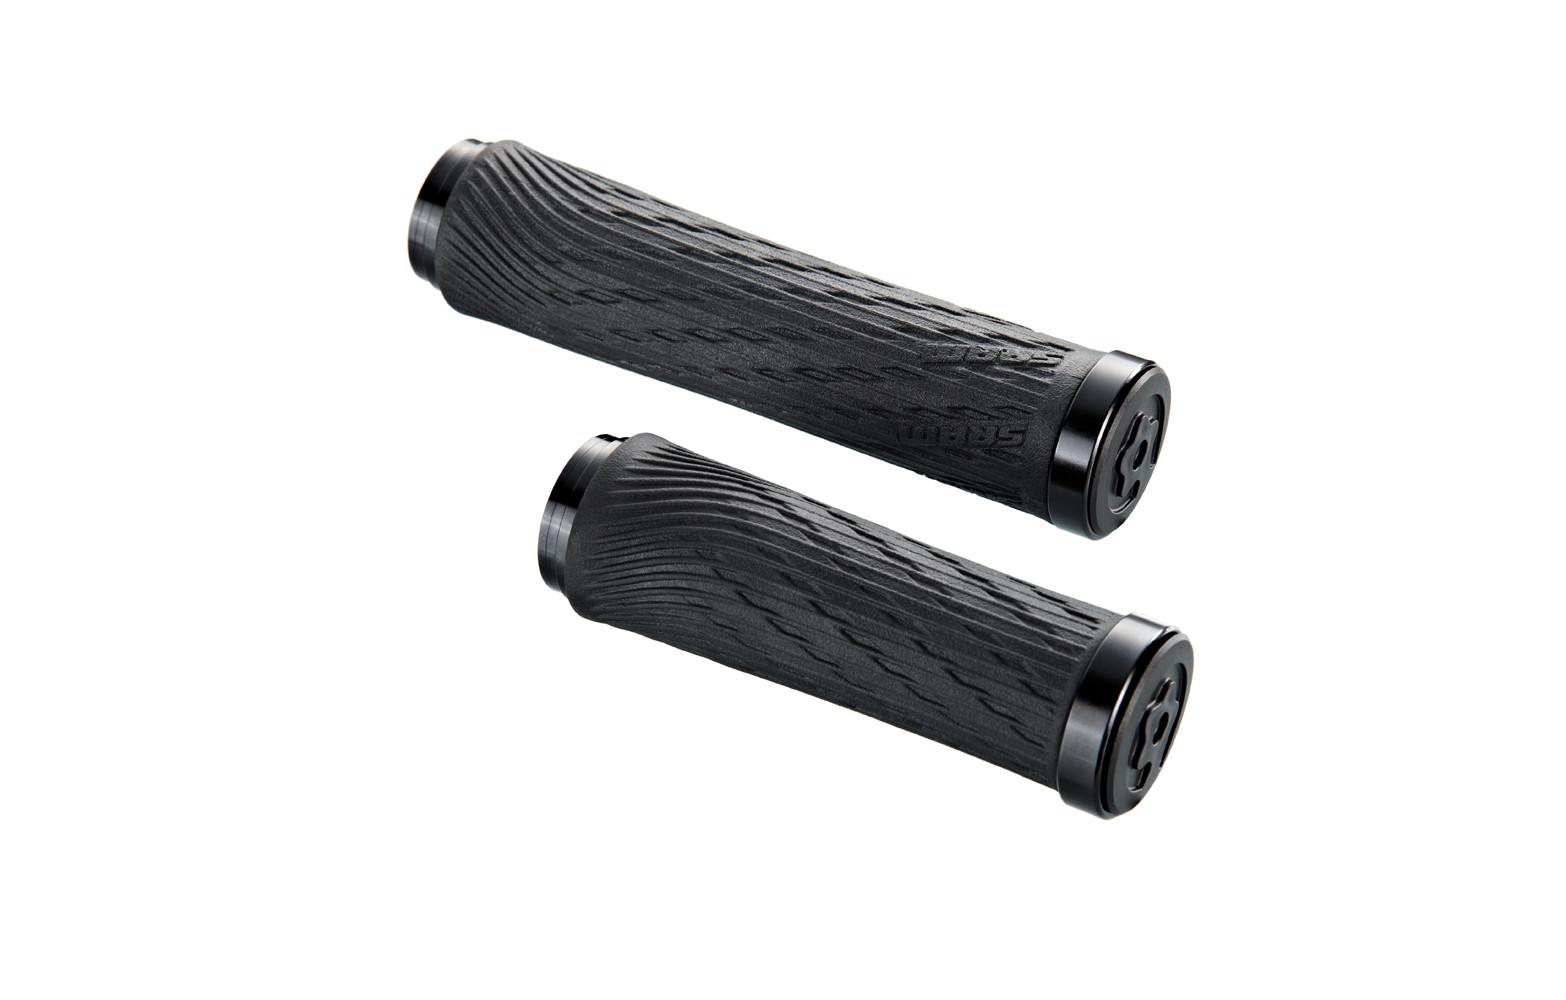 elegante di alta qualità shopping Manopole SRAM per Grip Shift X0, X01, XX, XX1 Nere | Alltricks.it